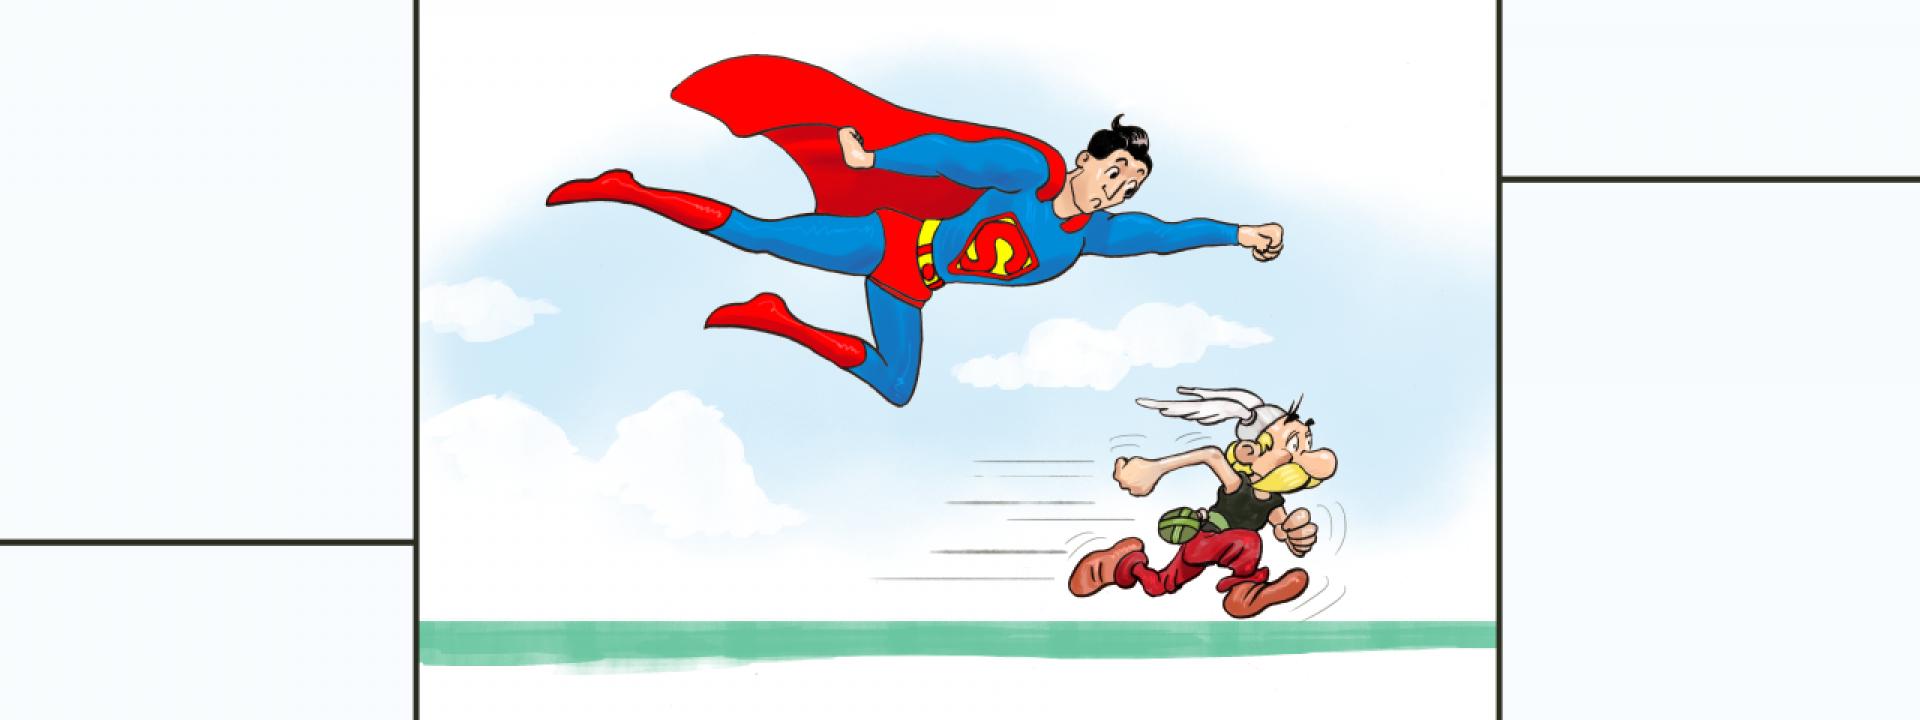 Comic: All weather heroes - May - Εικόνα